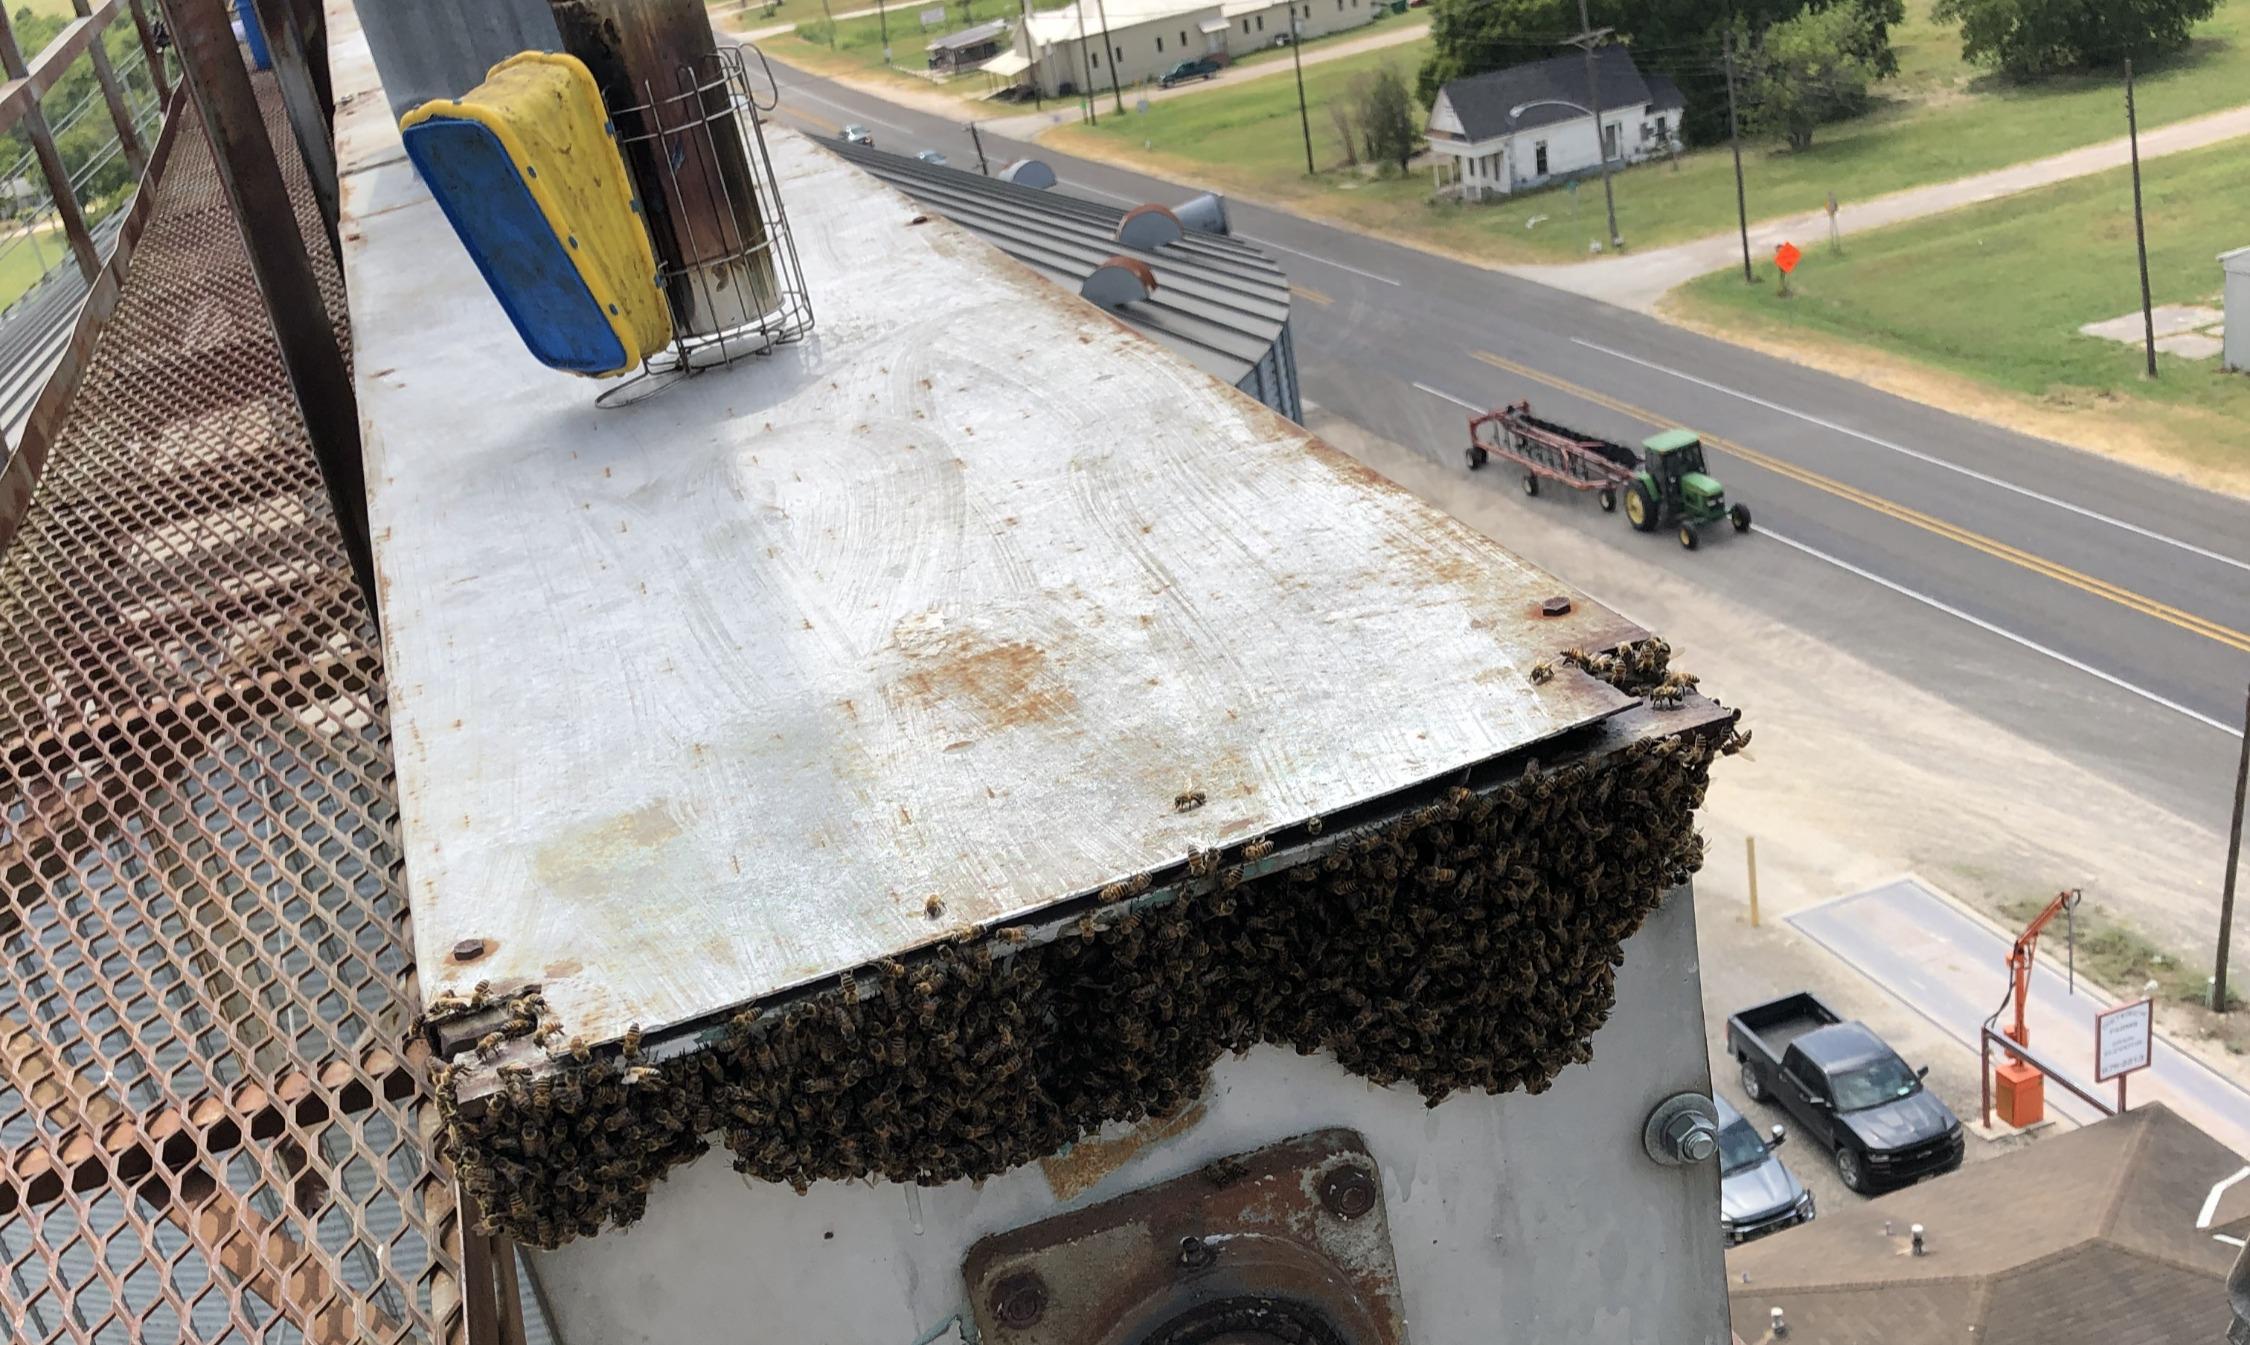 Bee hive high up on a grain elevator near waco texas